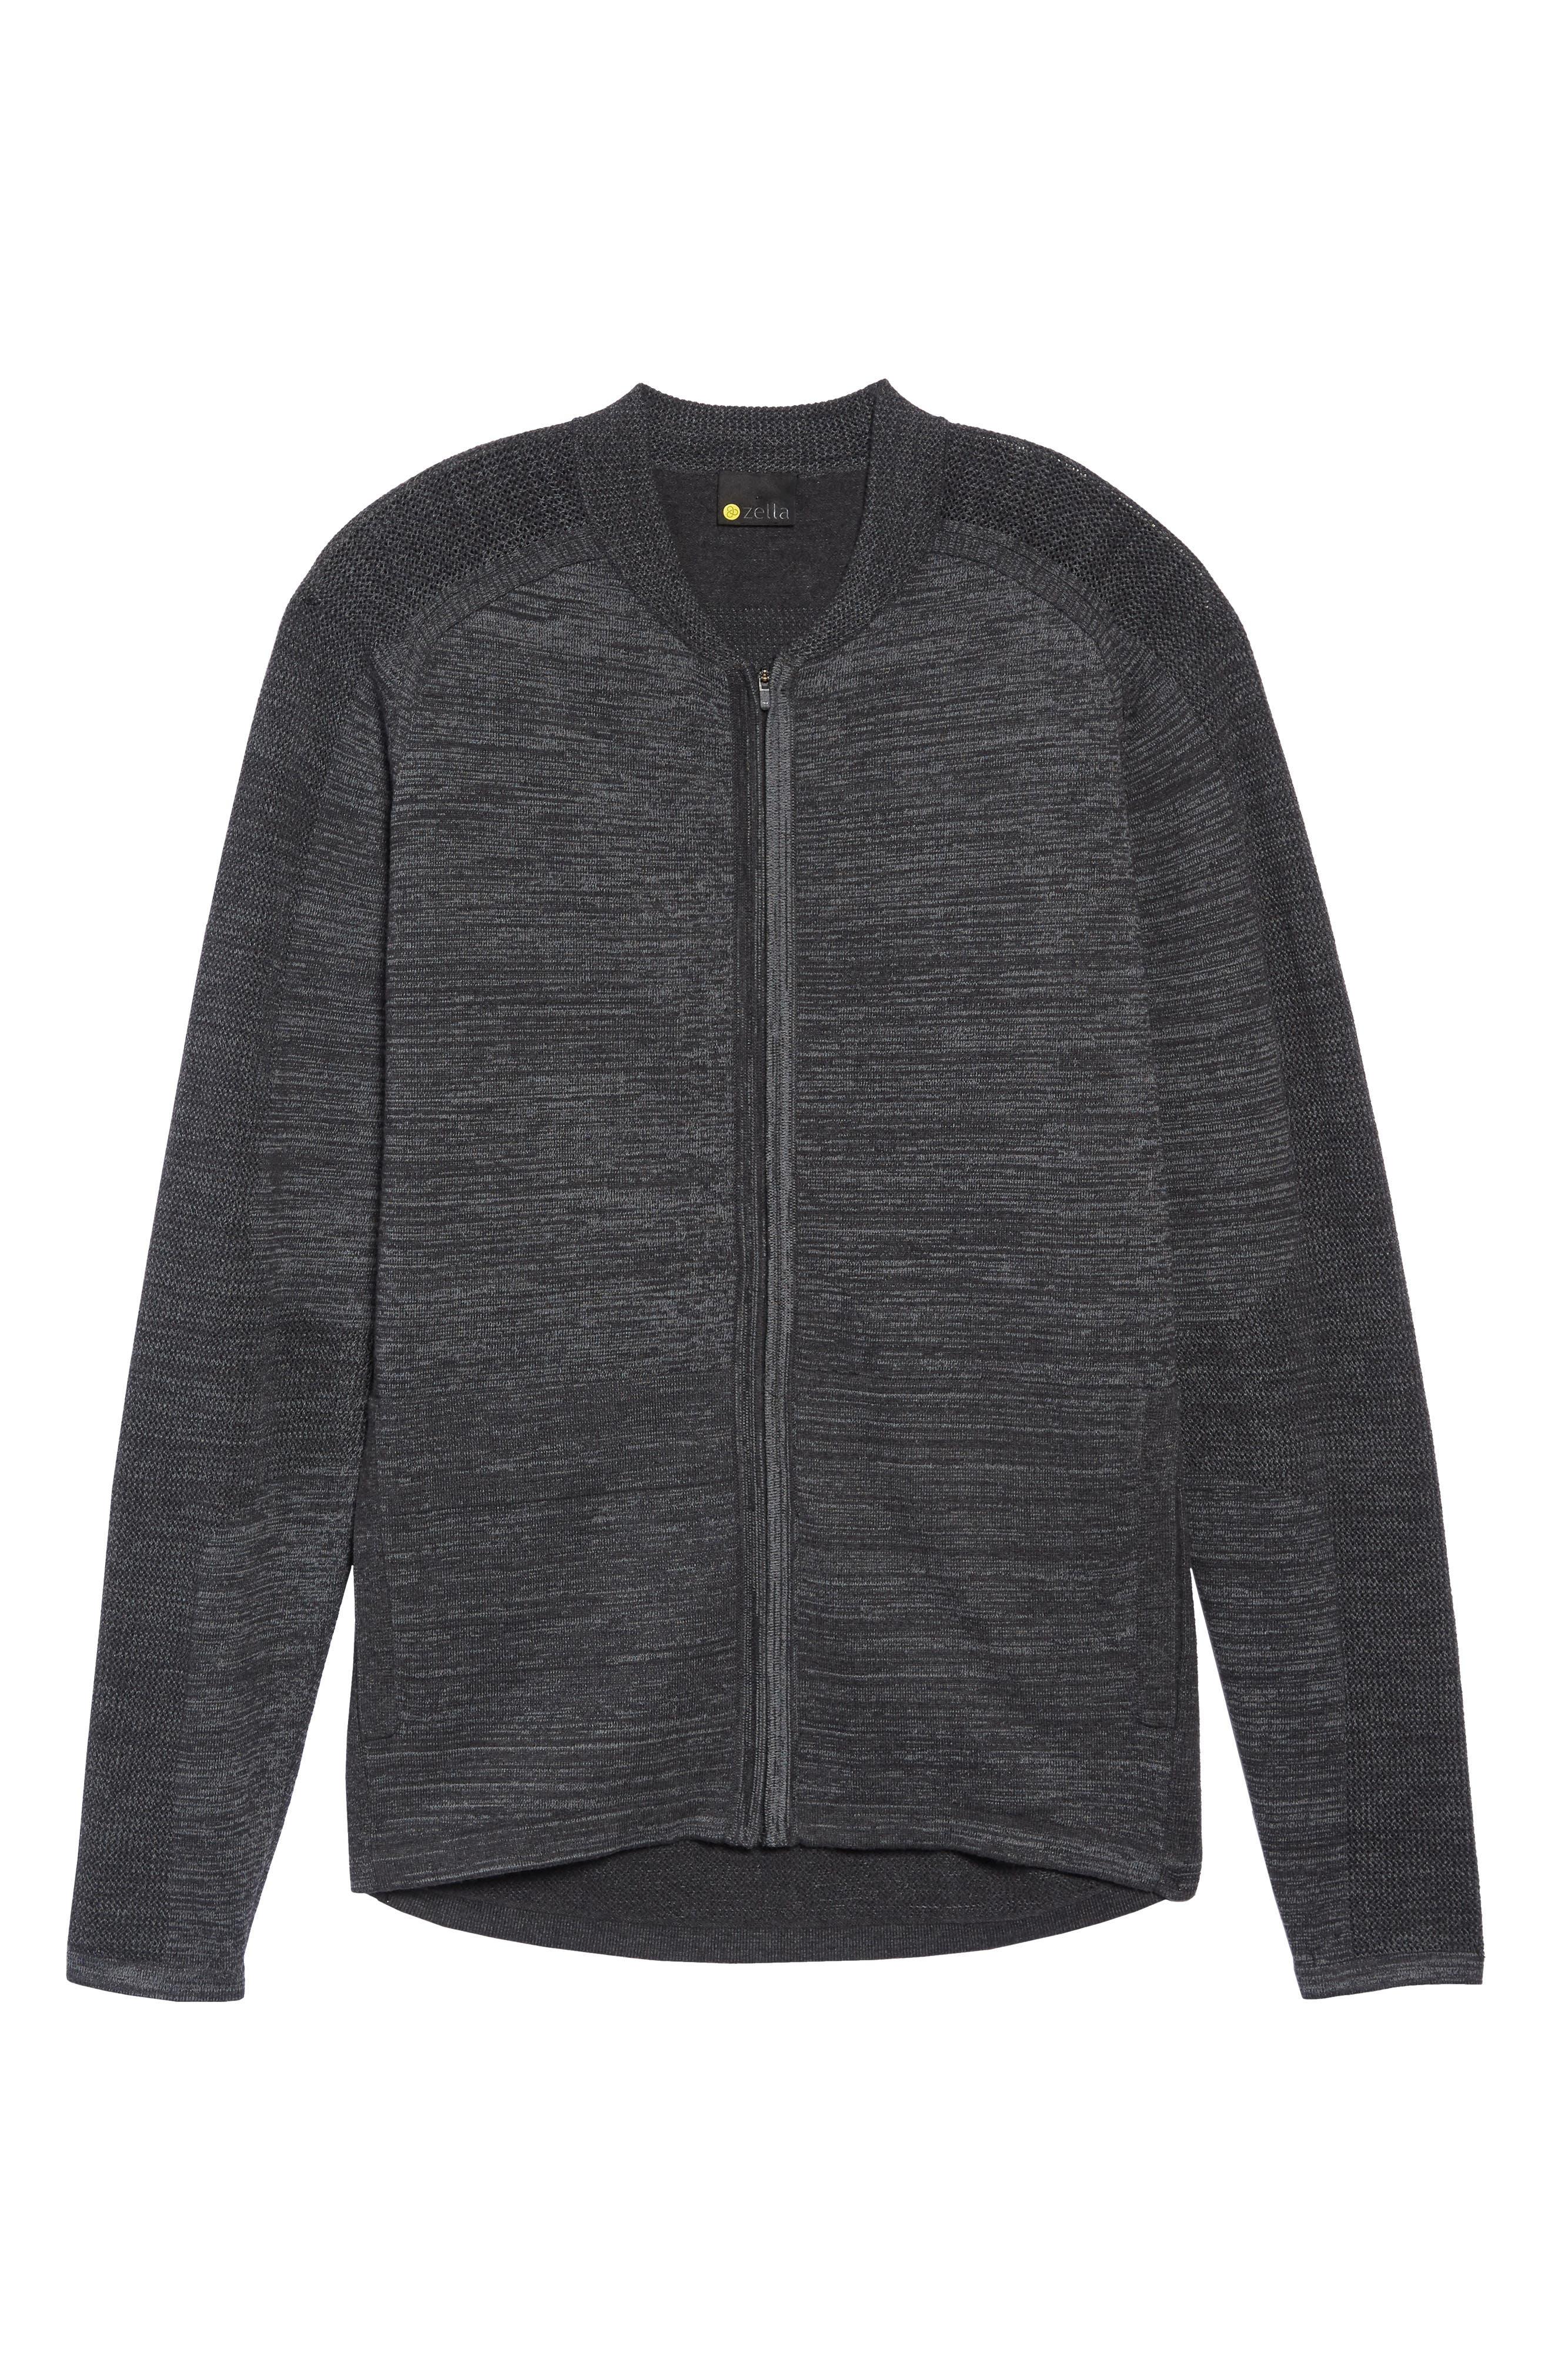 Tech Sweater Baseball Jacket,                             Alternate thumbnail 6, color,                             BLACK OXIDE SPACEDYE